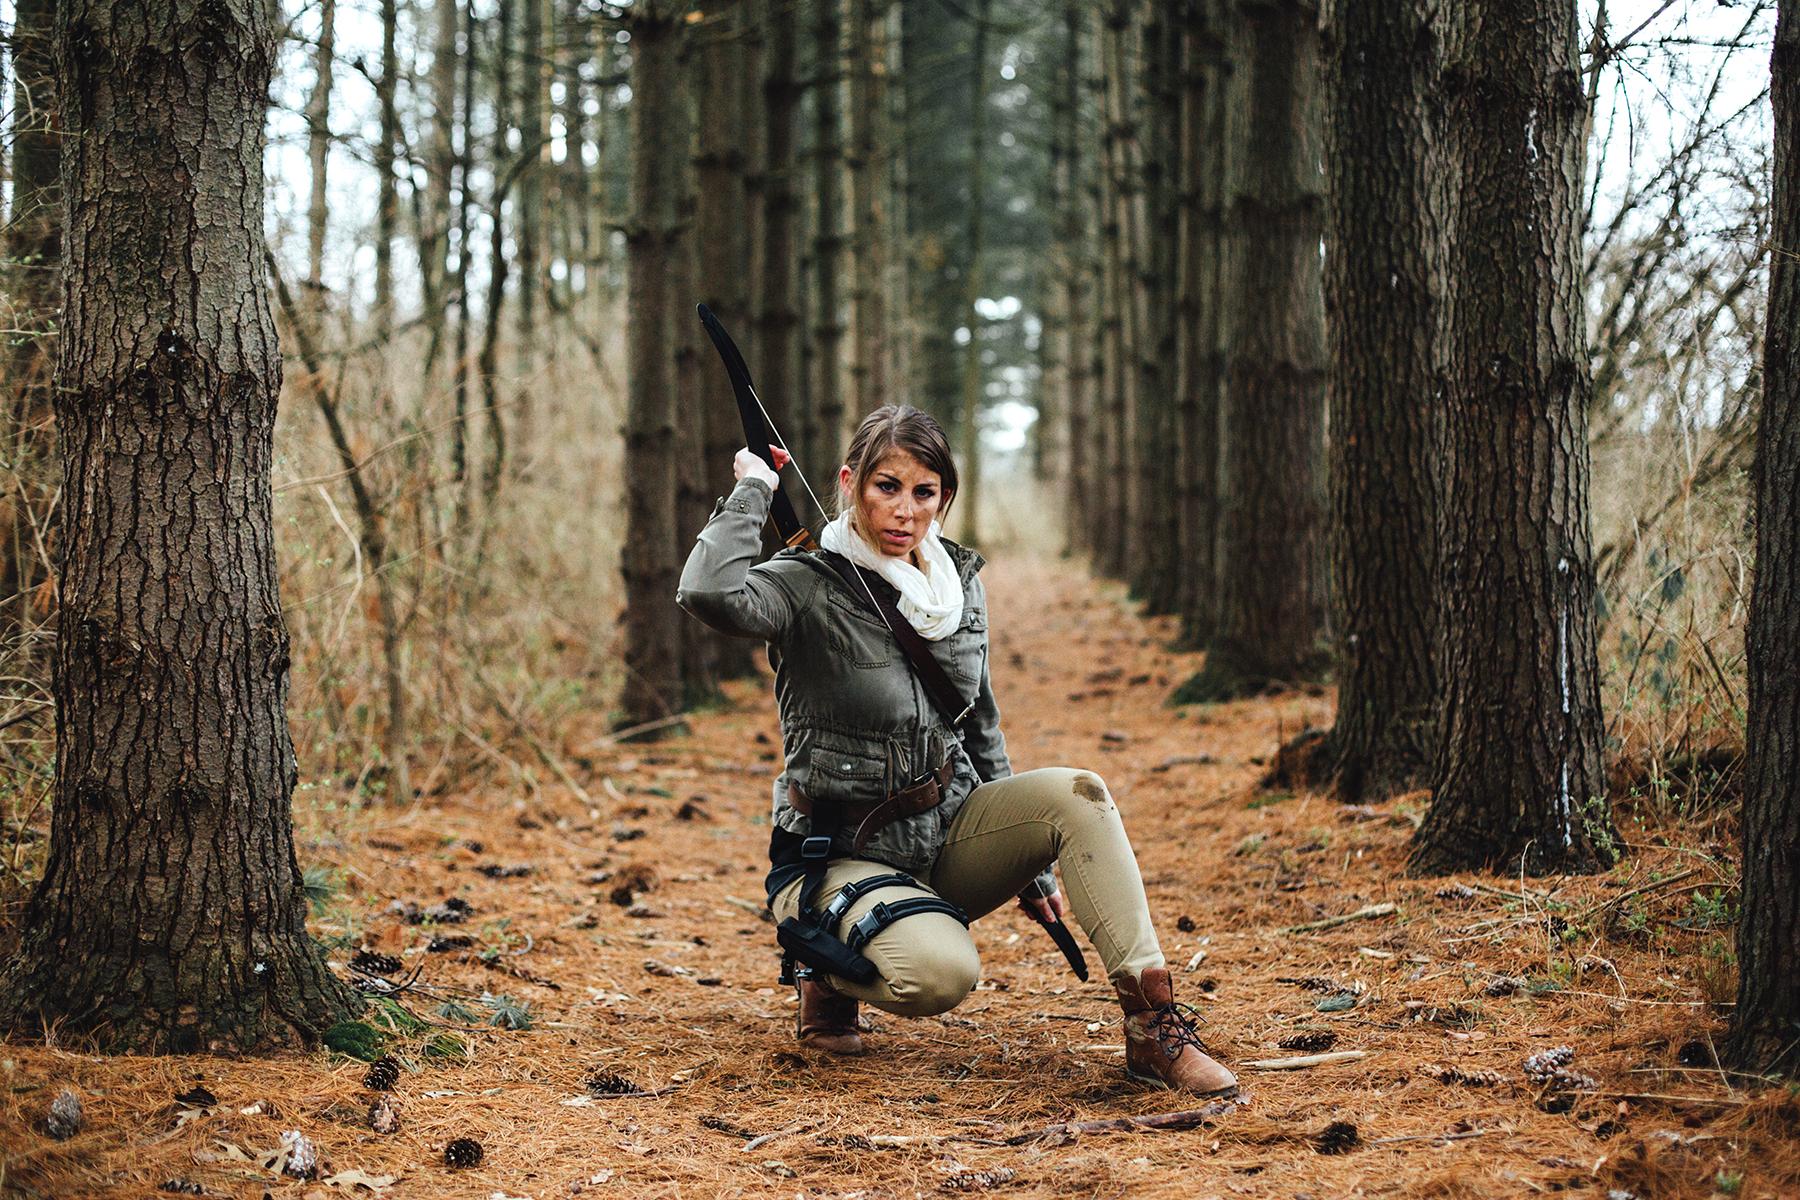 42: The Tomb Raider